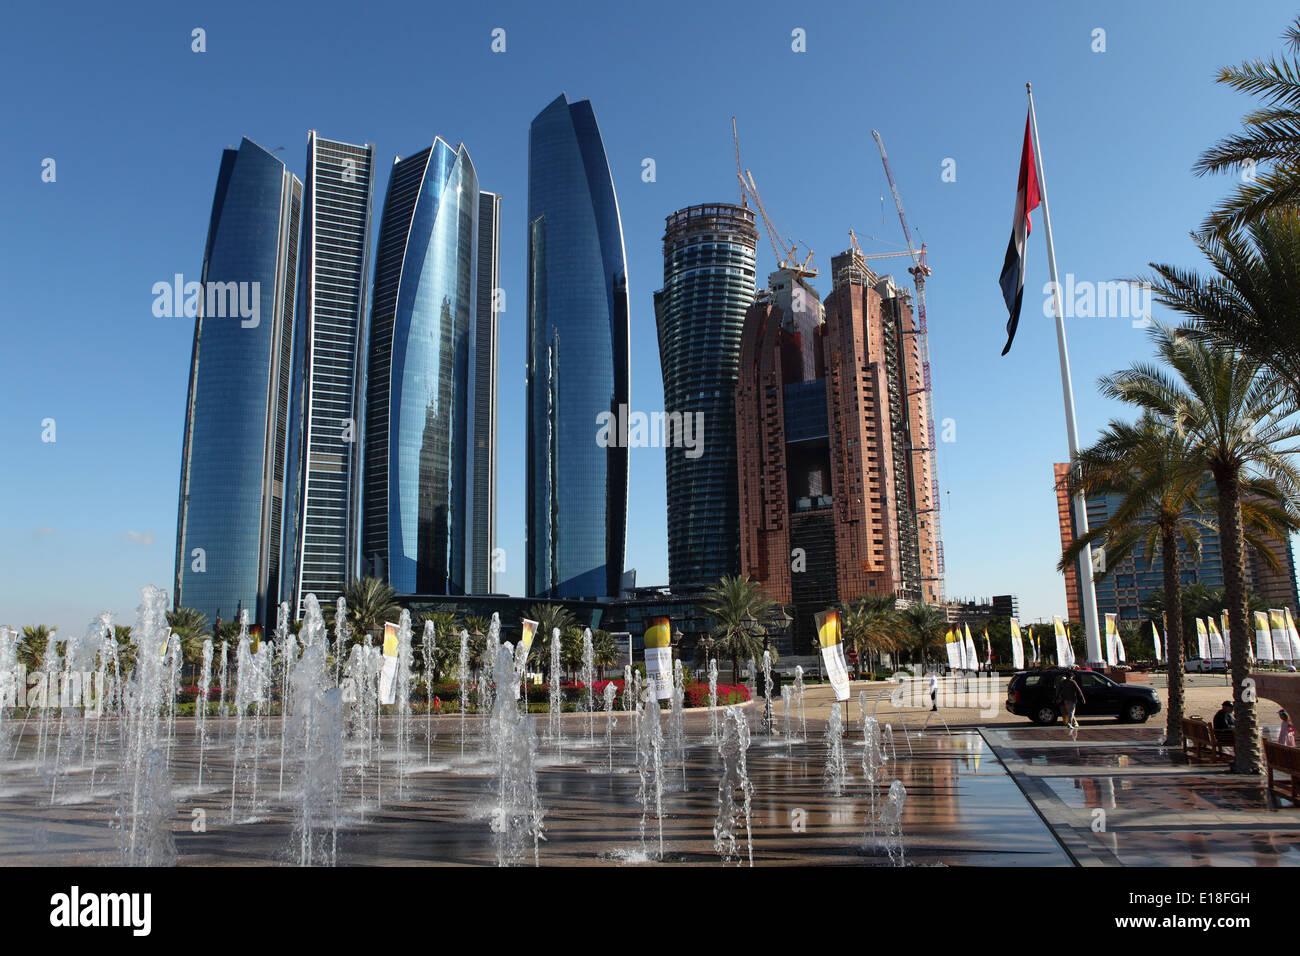 The Etihad Towers in Abu Dhabi. - Stock Image